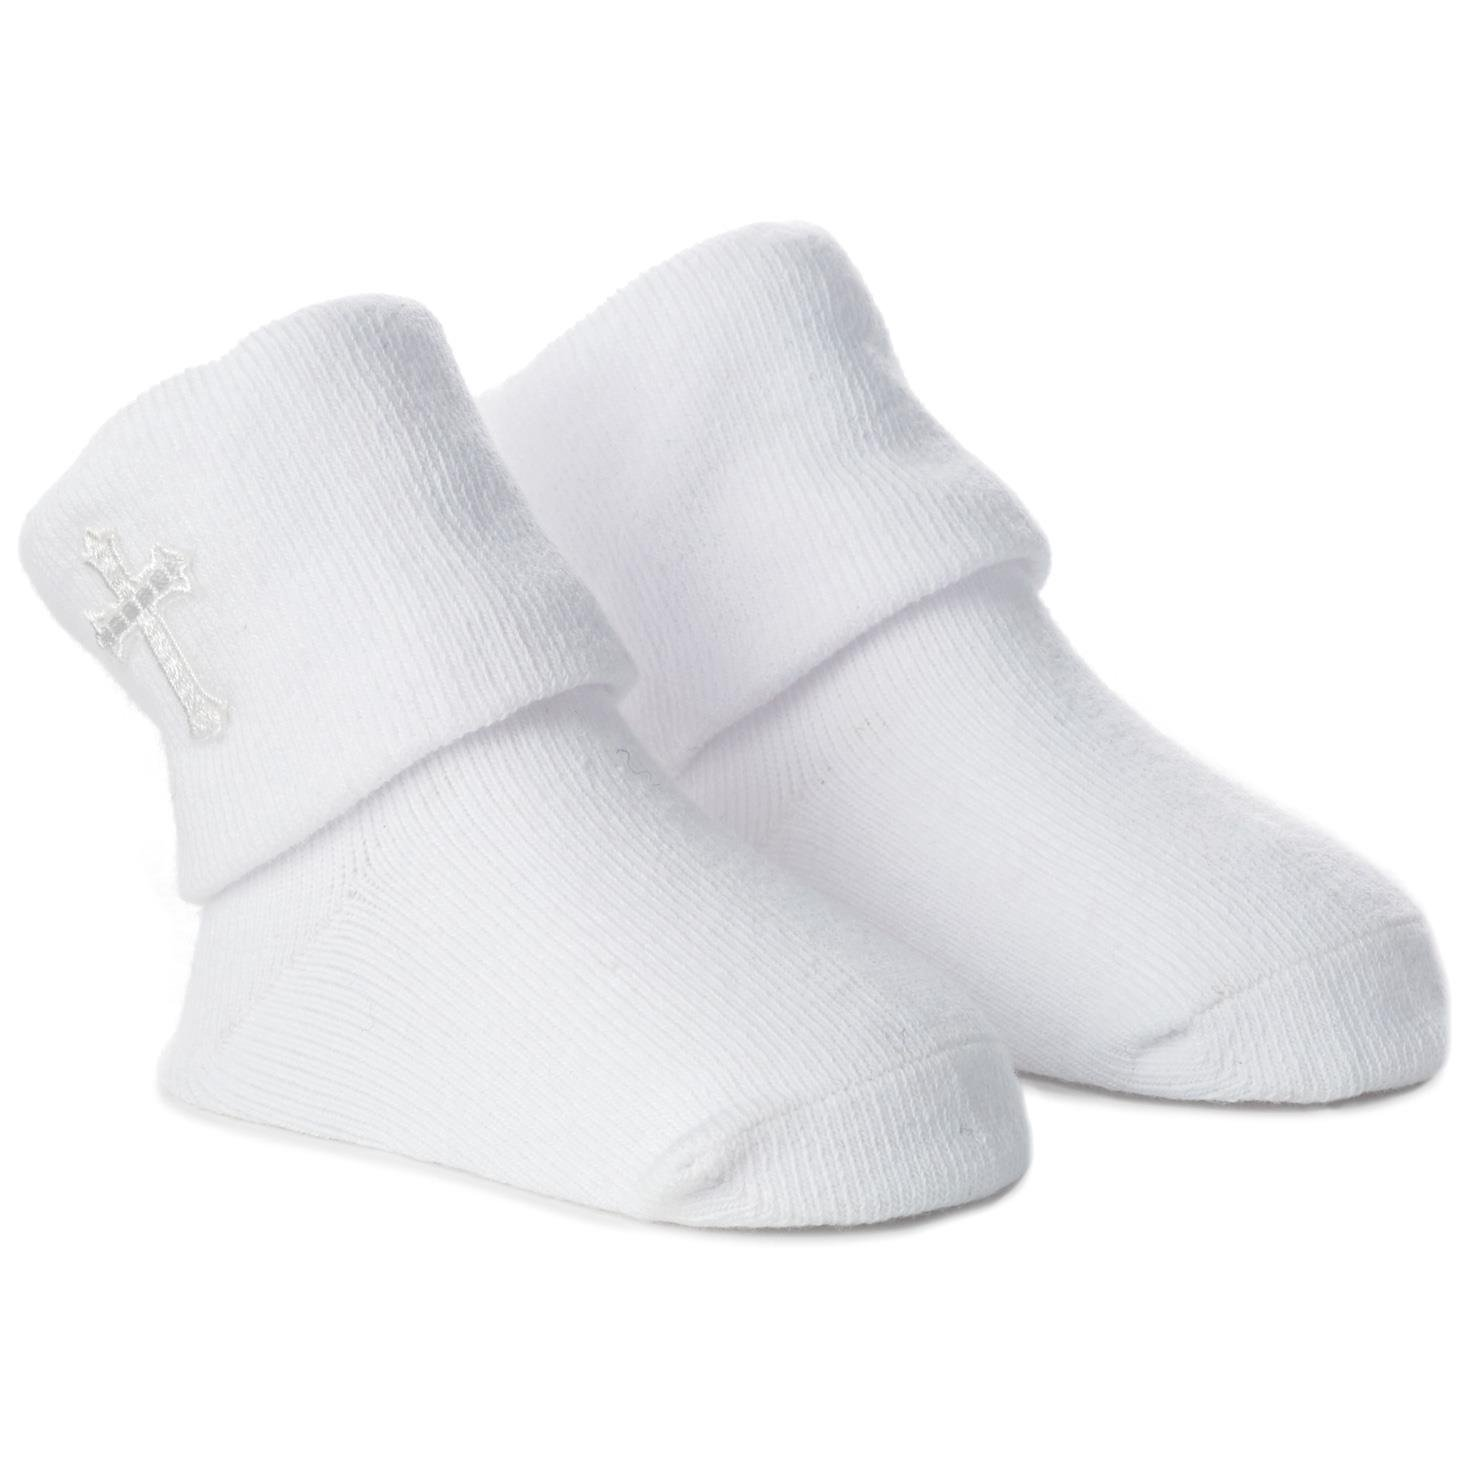 0-12 Months Hallmark Embroidered Cross Baby Socks